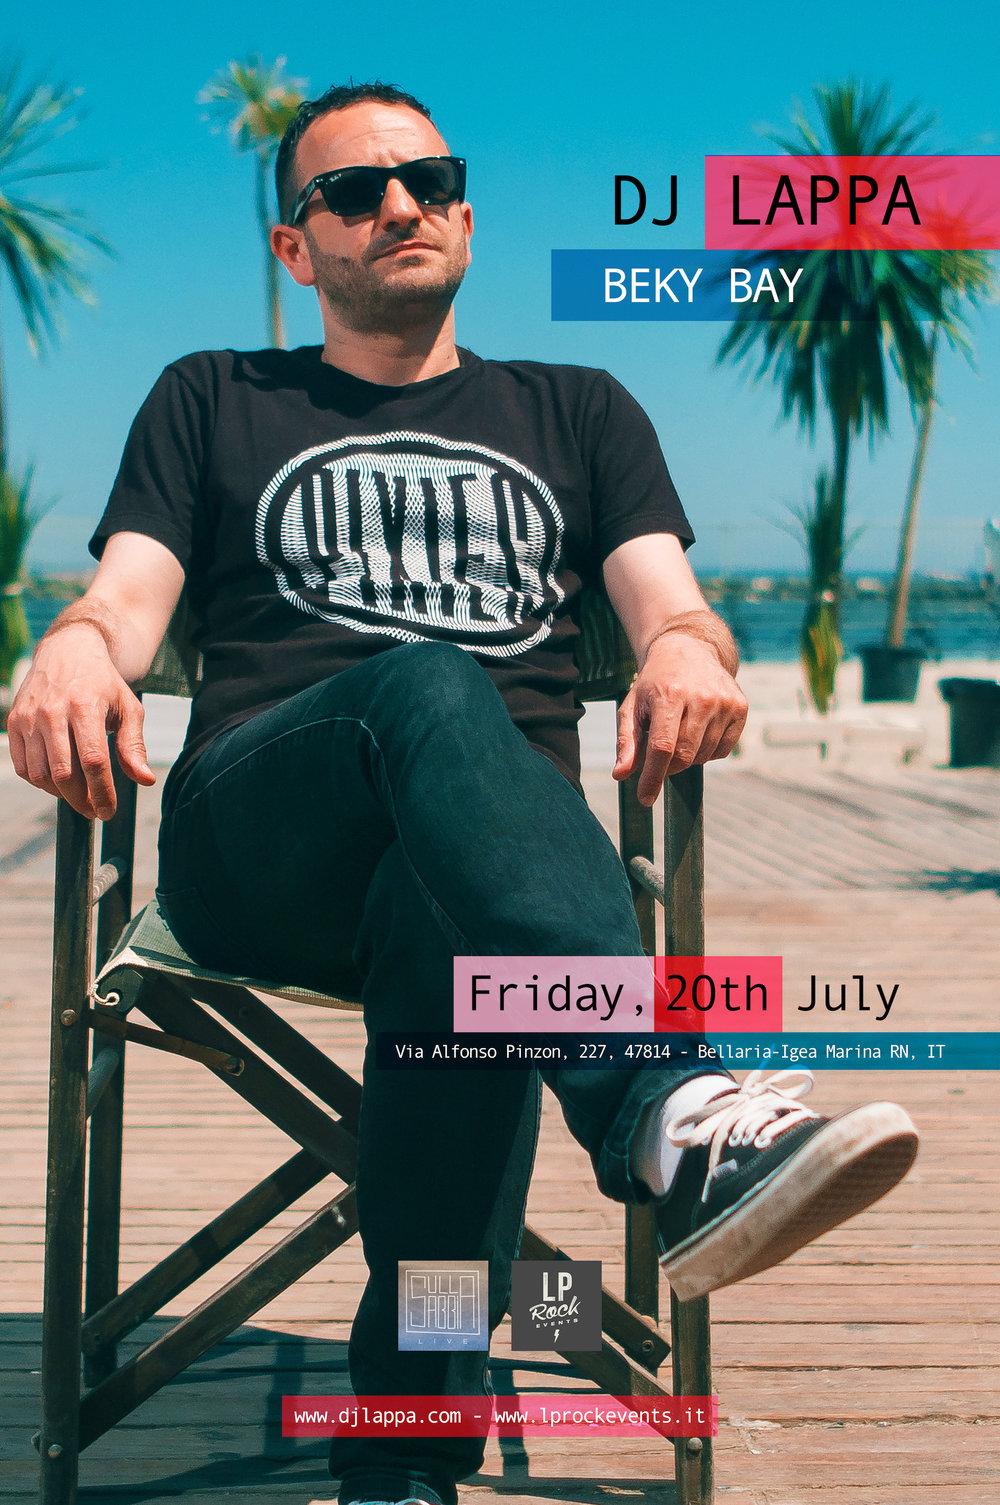 beky bay 20 luglio 18 low.jpg